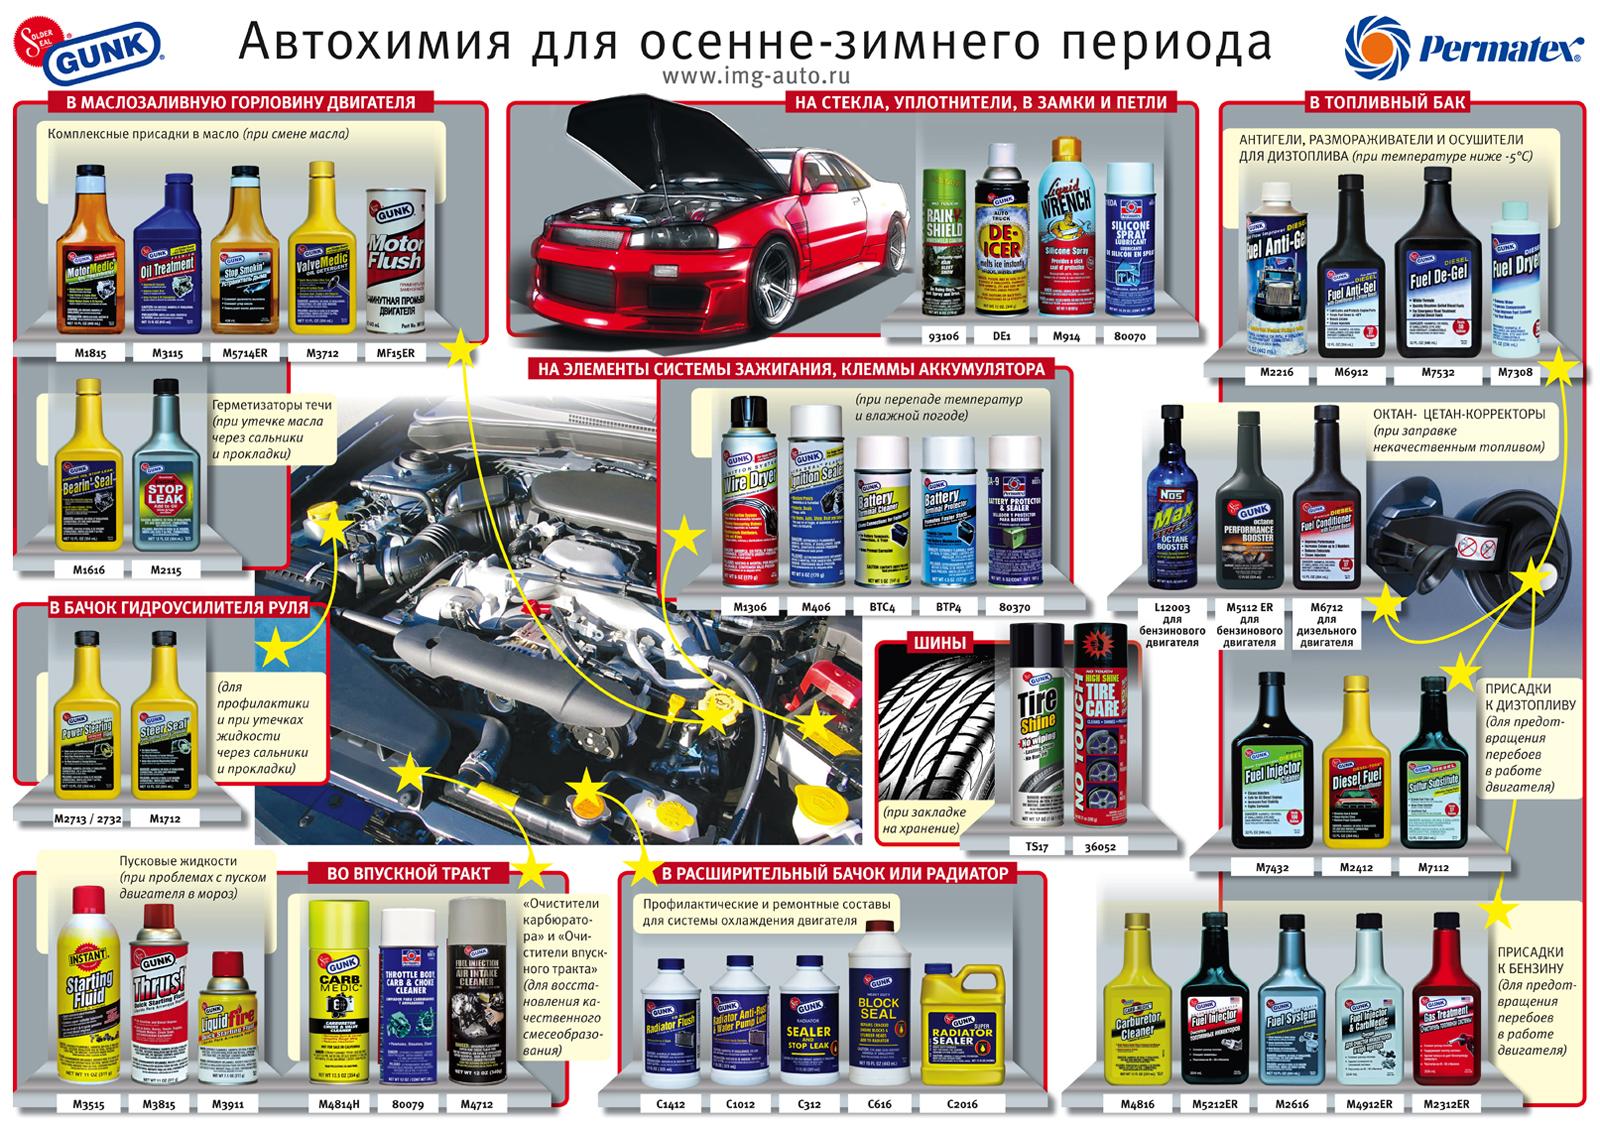 Автохимия gunk плакаты.